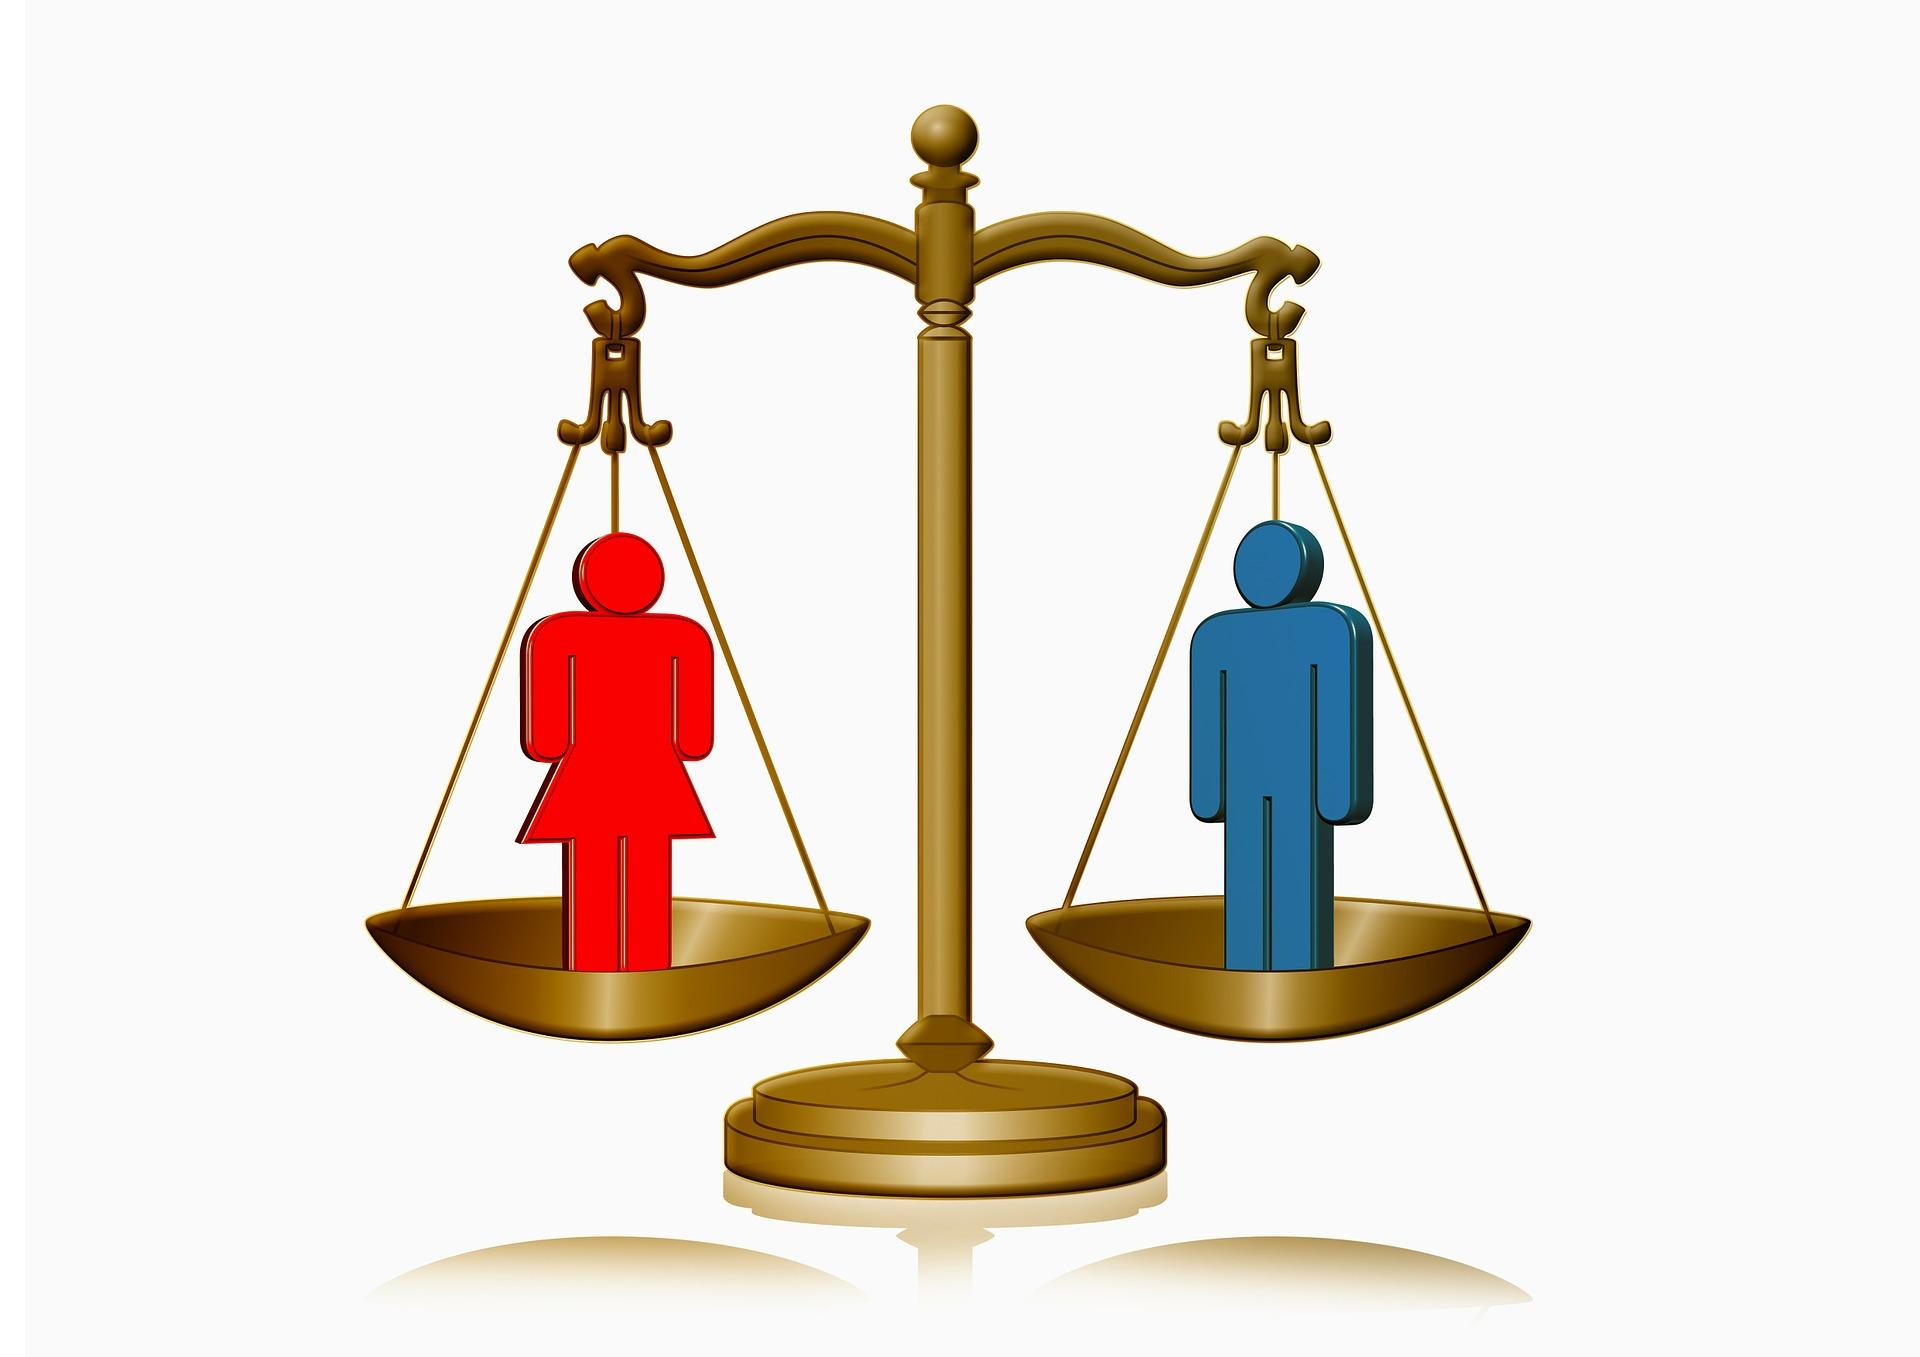 INDEX ÉGALITÉ FEMMES/HOMMES